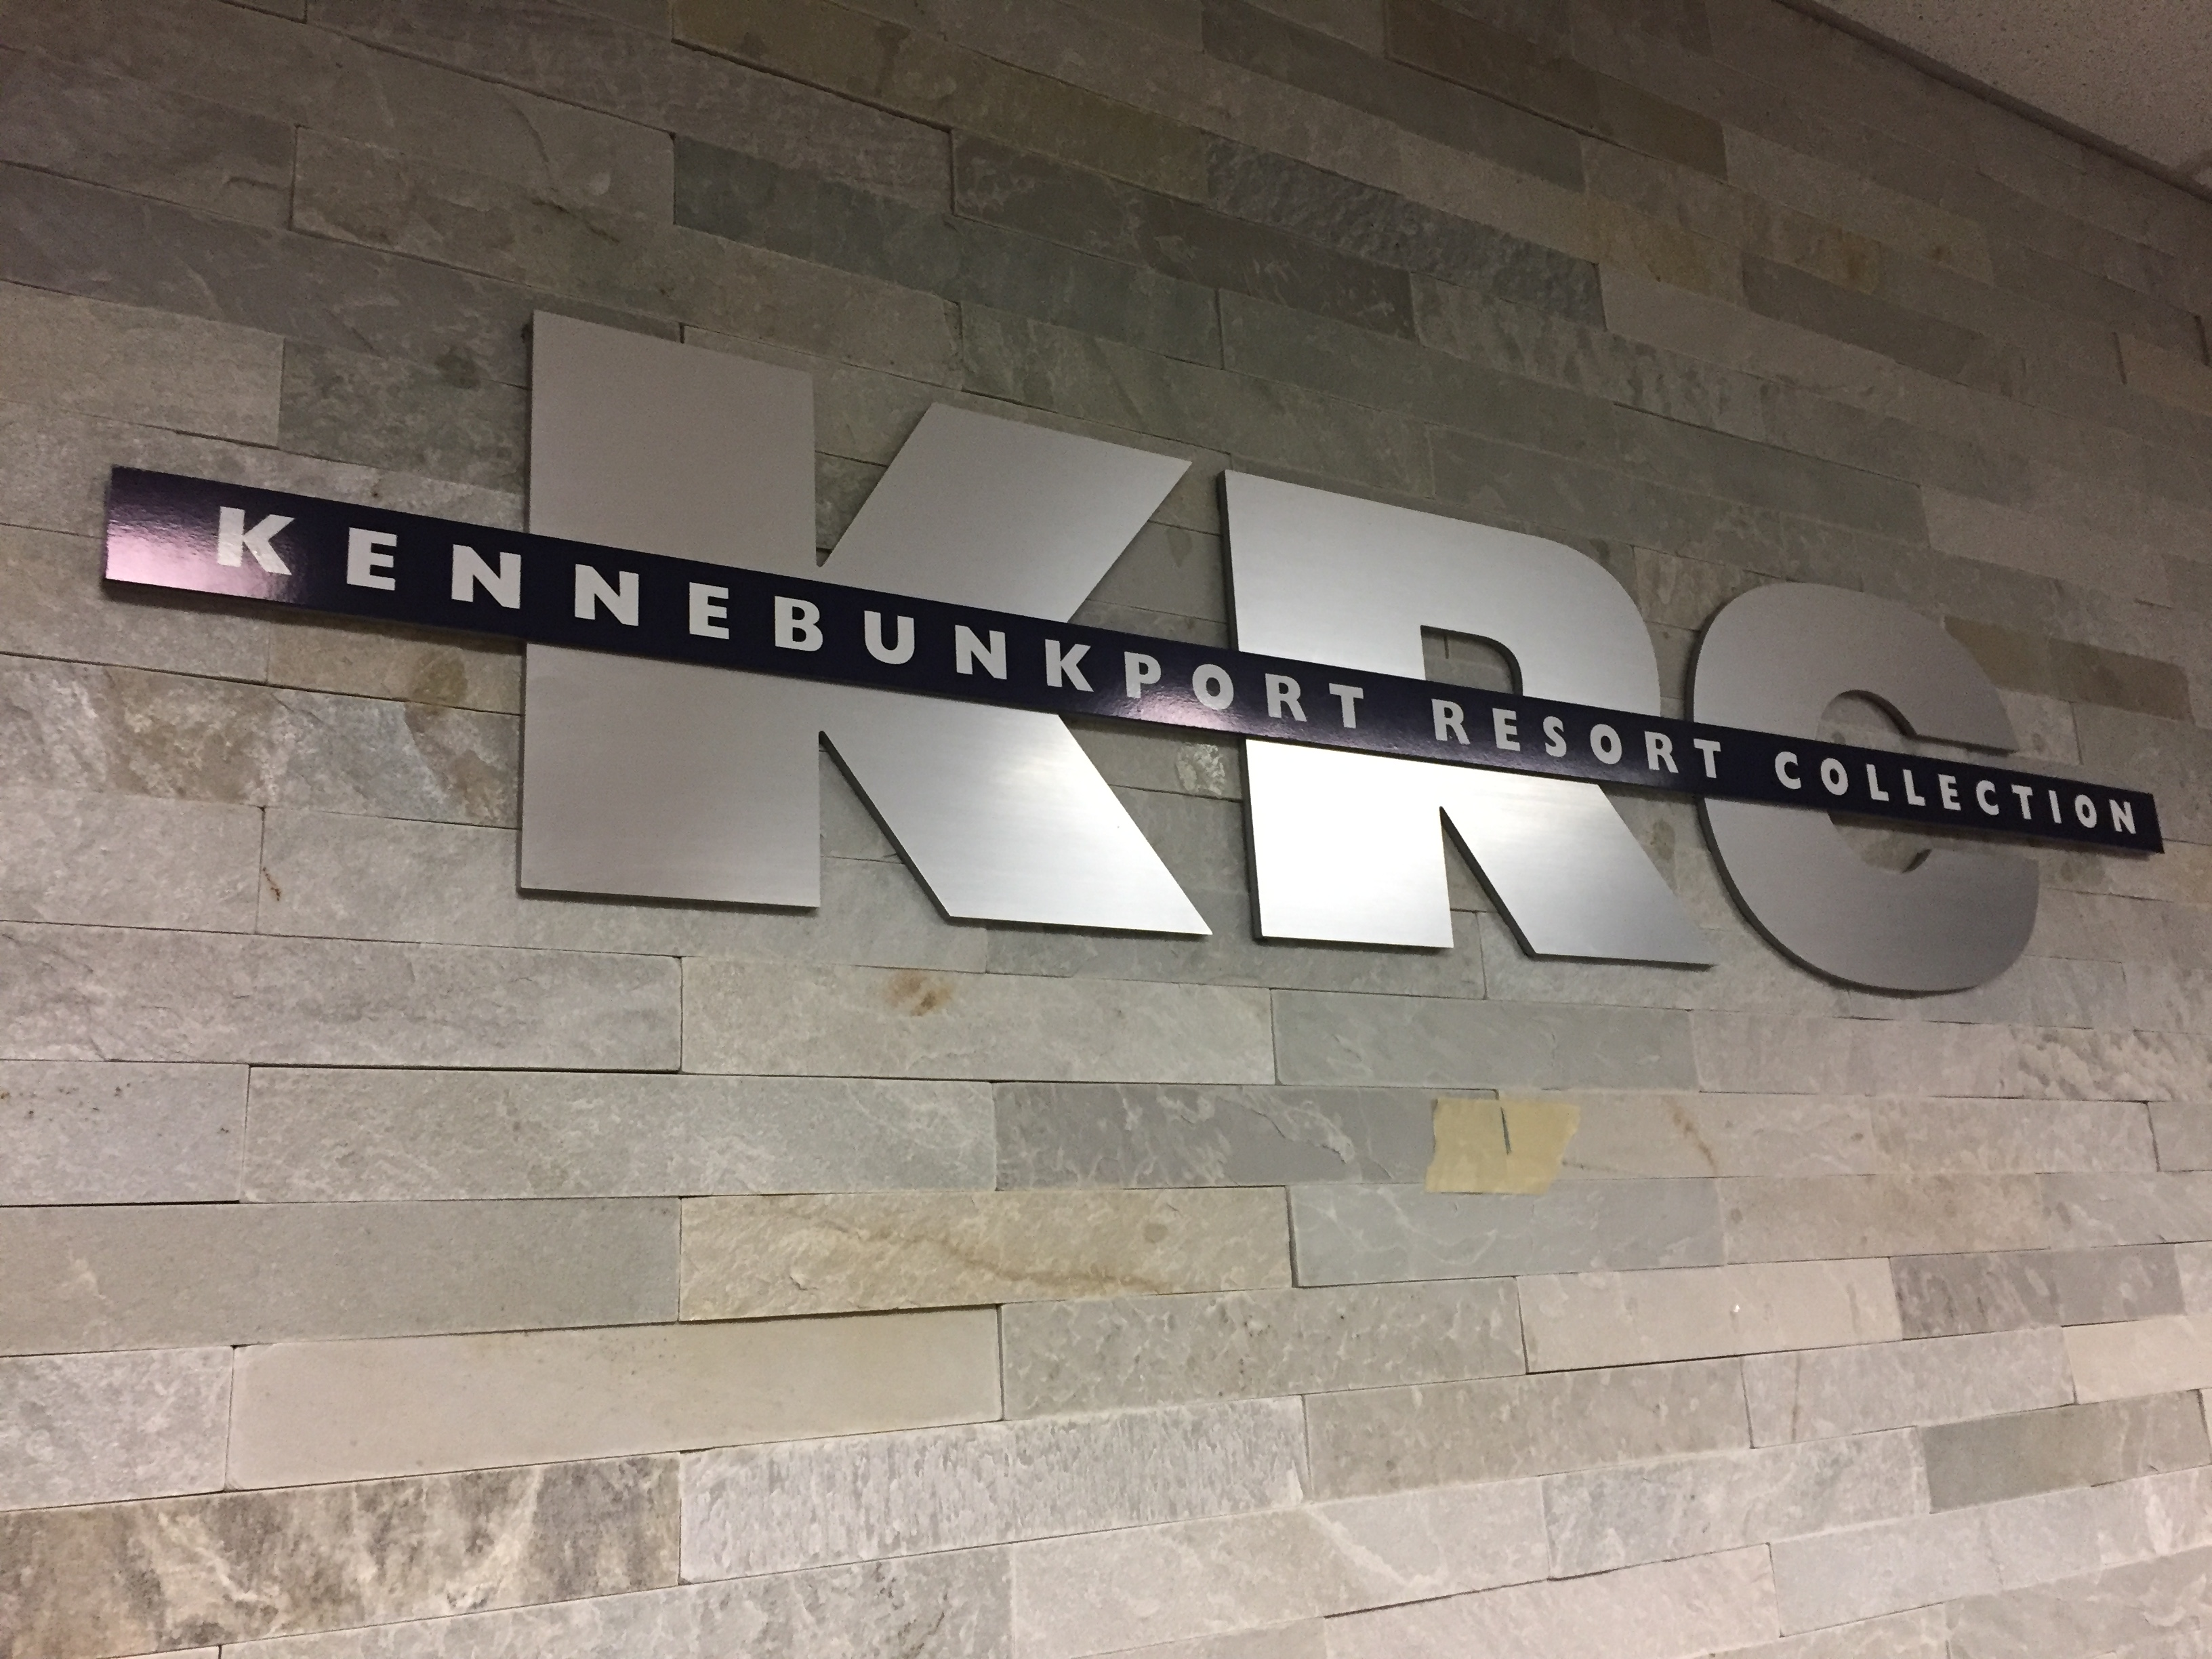 Kennebunkport Resort Collection